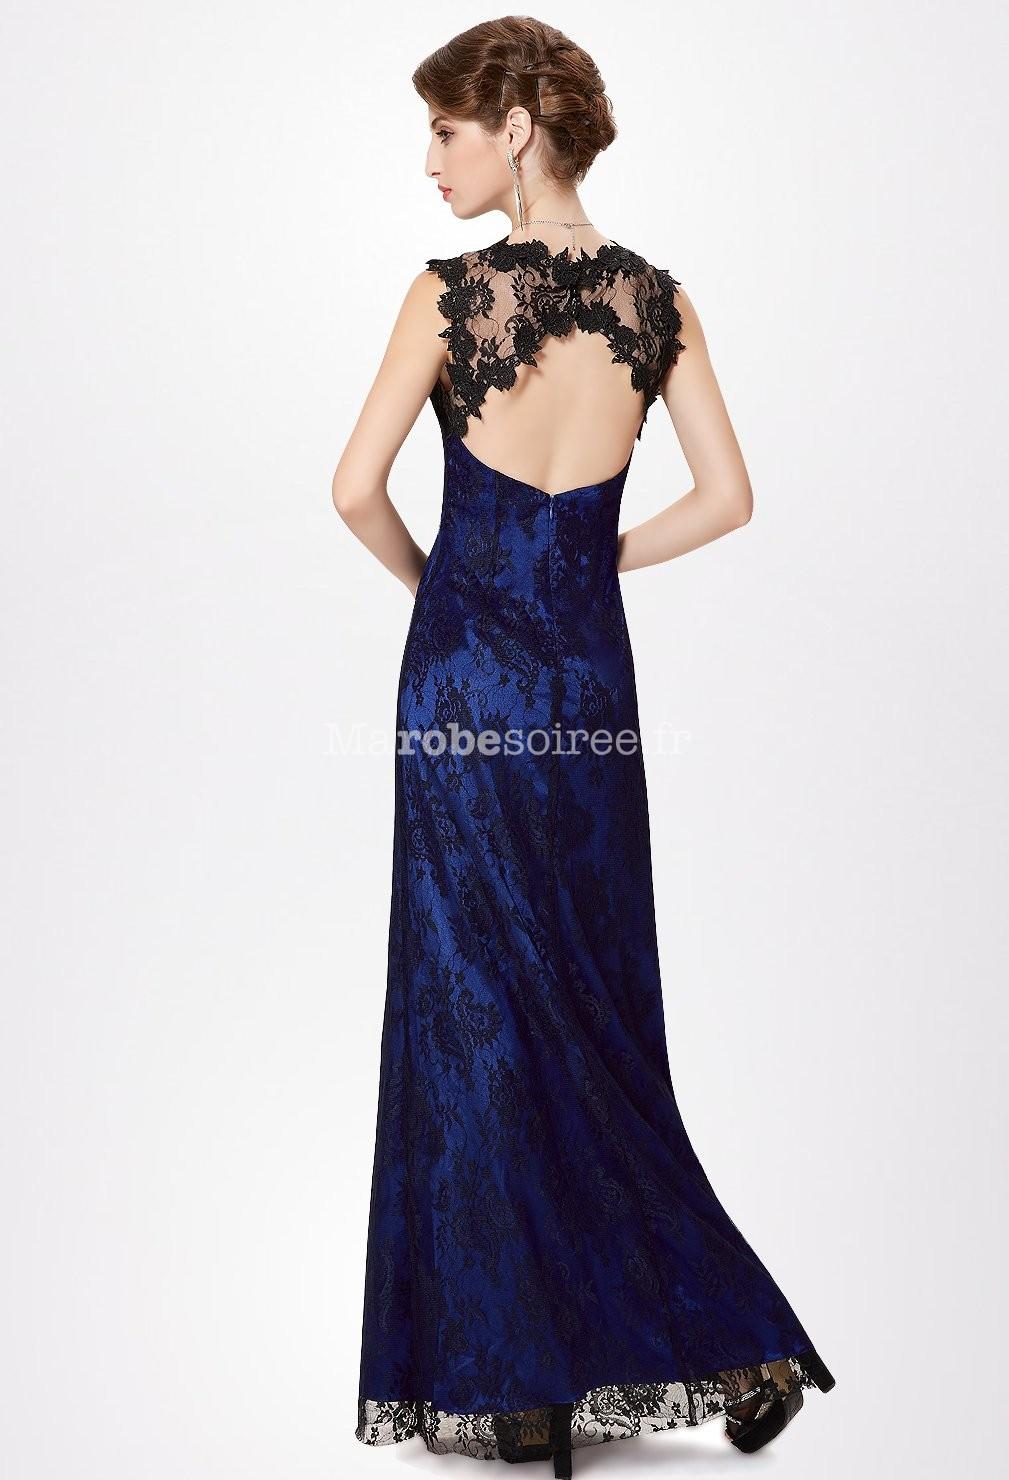 robe longue de satin bleu rehauss e de dentelle noire. Black Bedroom Furniture Sets. Home Design Ideas